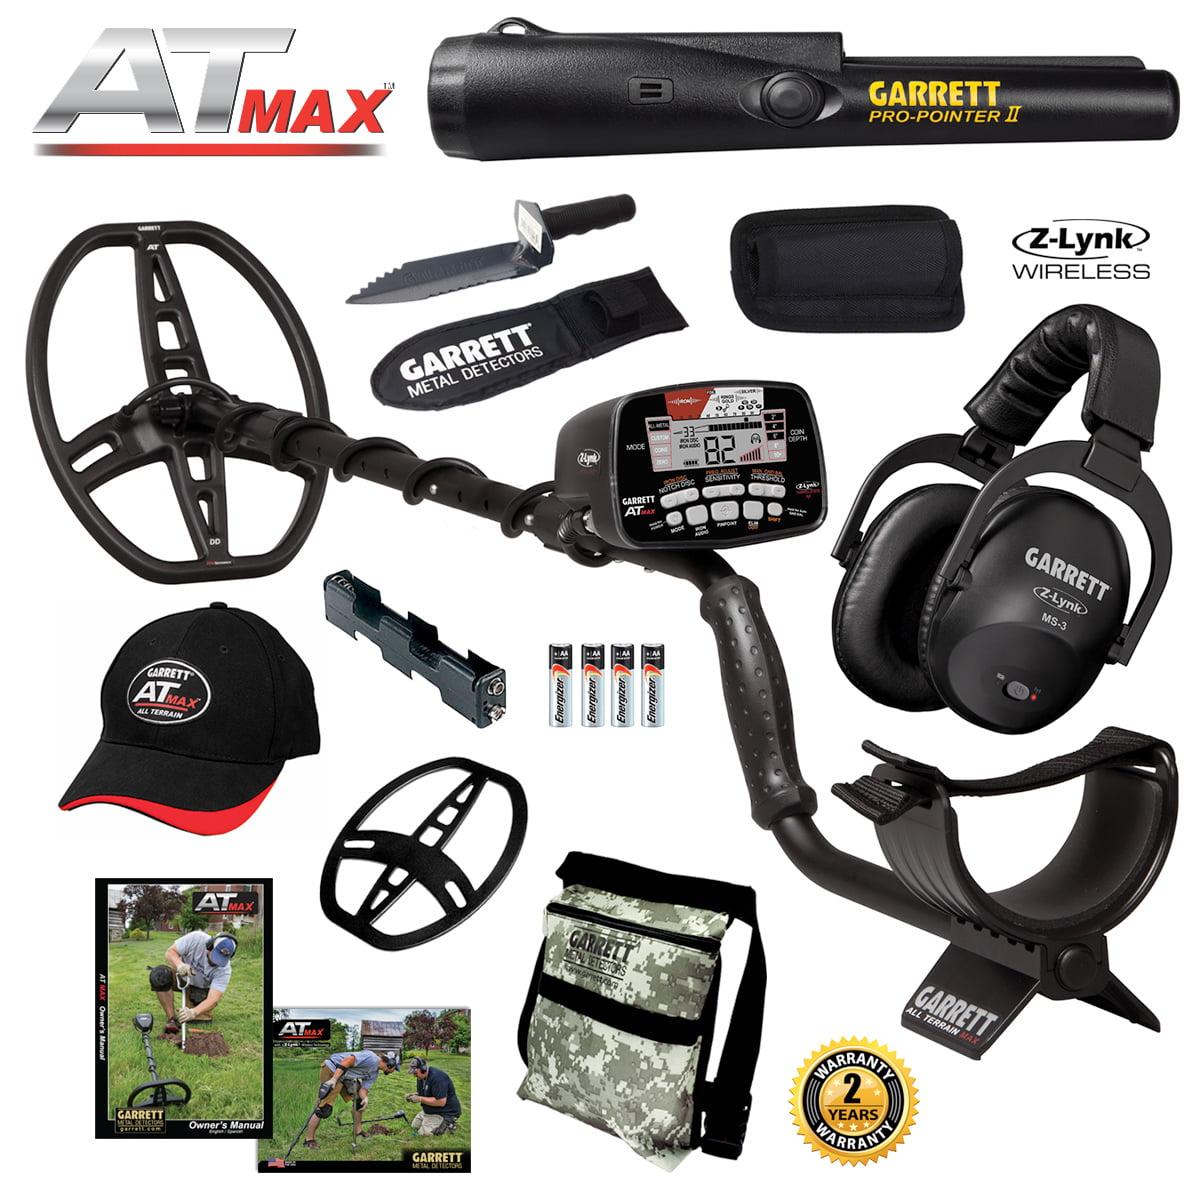 Garrett AT MAX Metal Detector, MS-3 Headphones, Pro-Pointer II, Daypack & Digger by